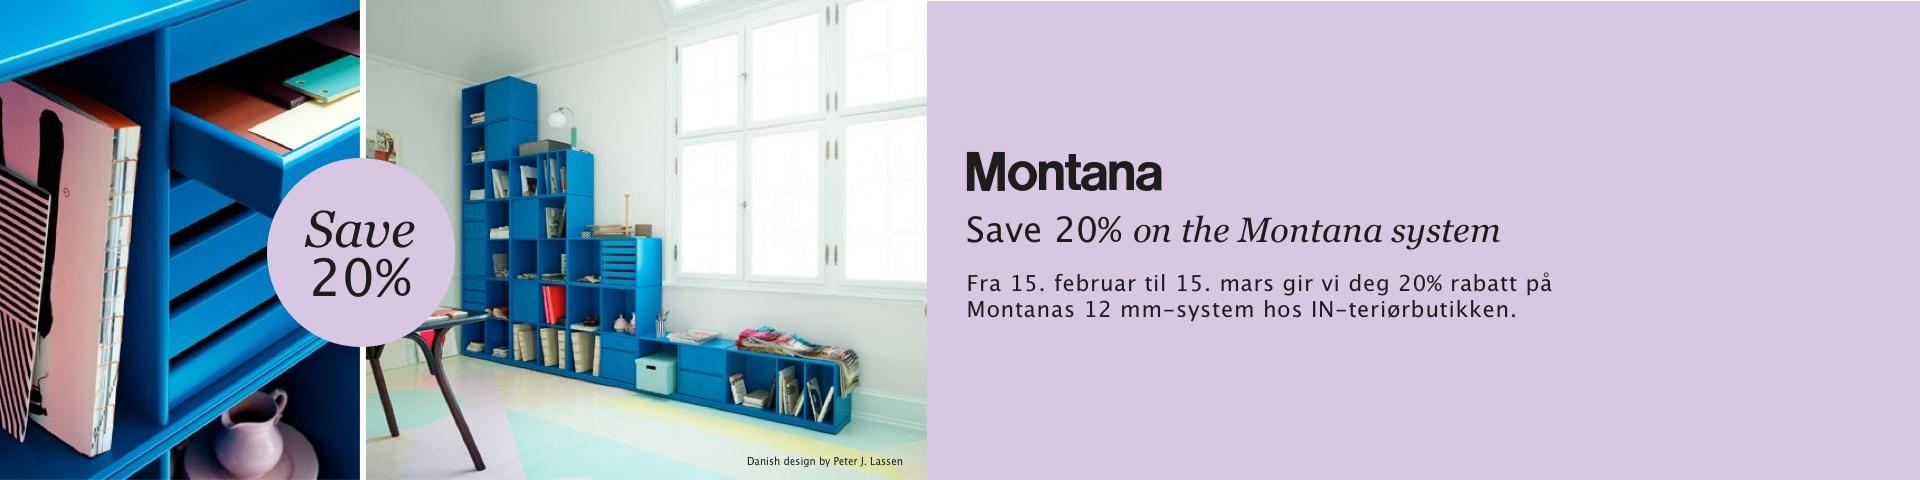 Save 20% on Montana system